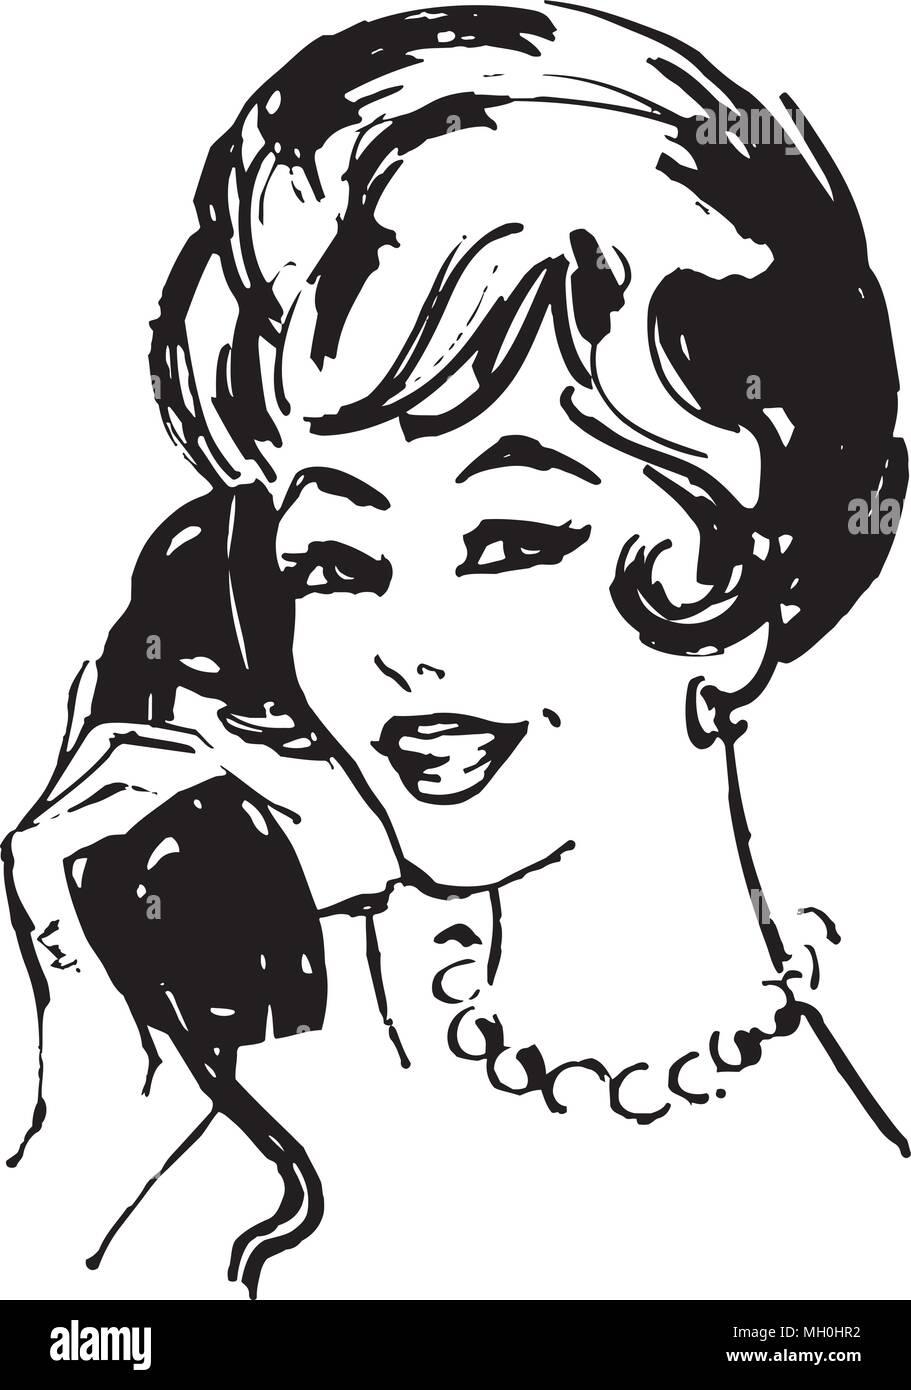 Woman On The Phone - Retro Clipart Illustration Stock ...